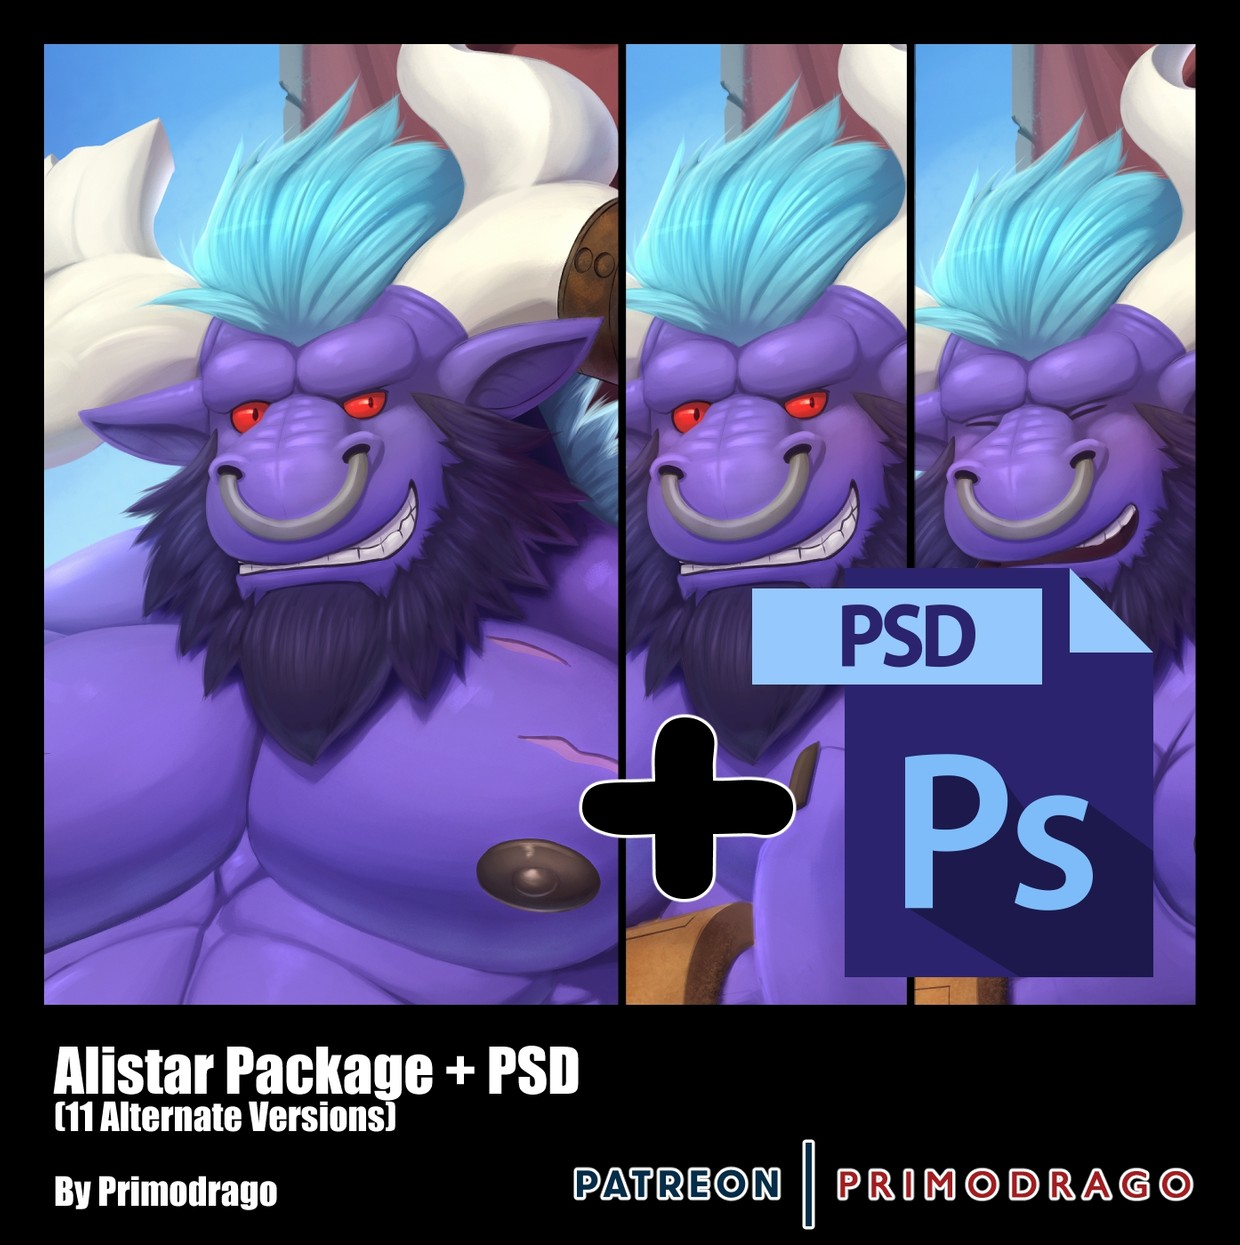 Alistar Artpack + PSD File